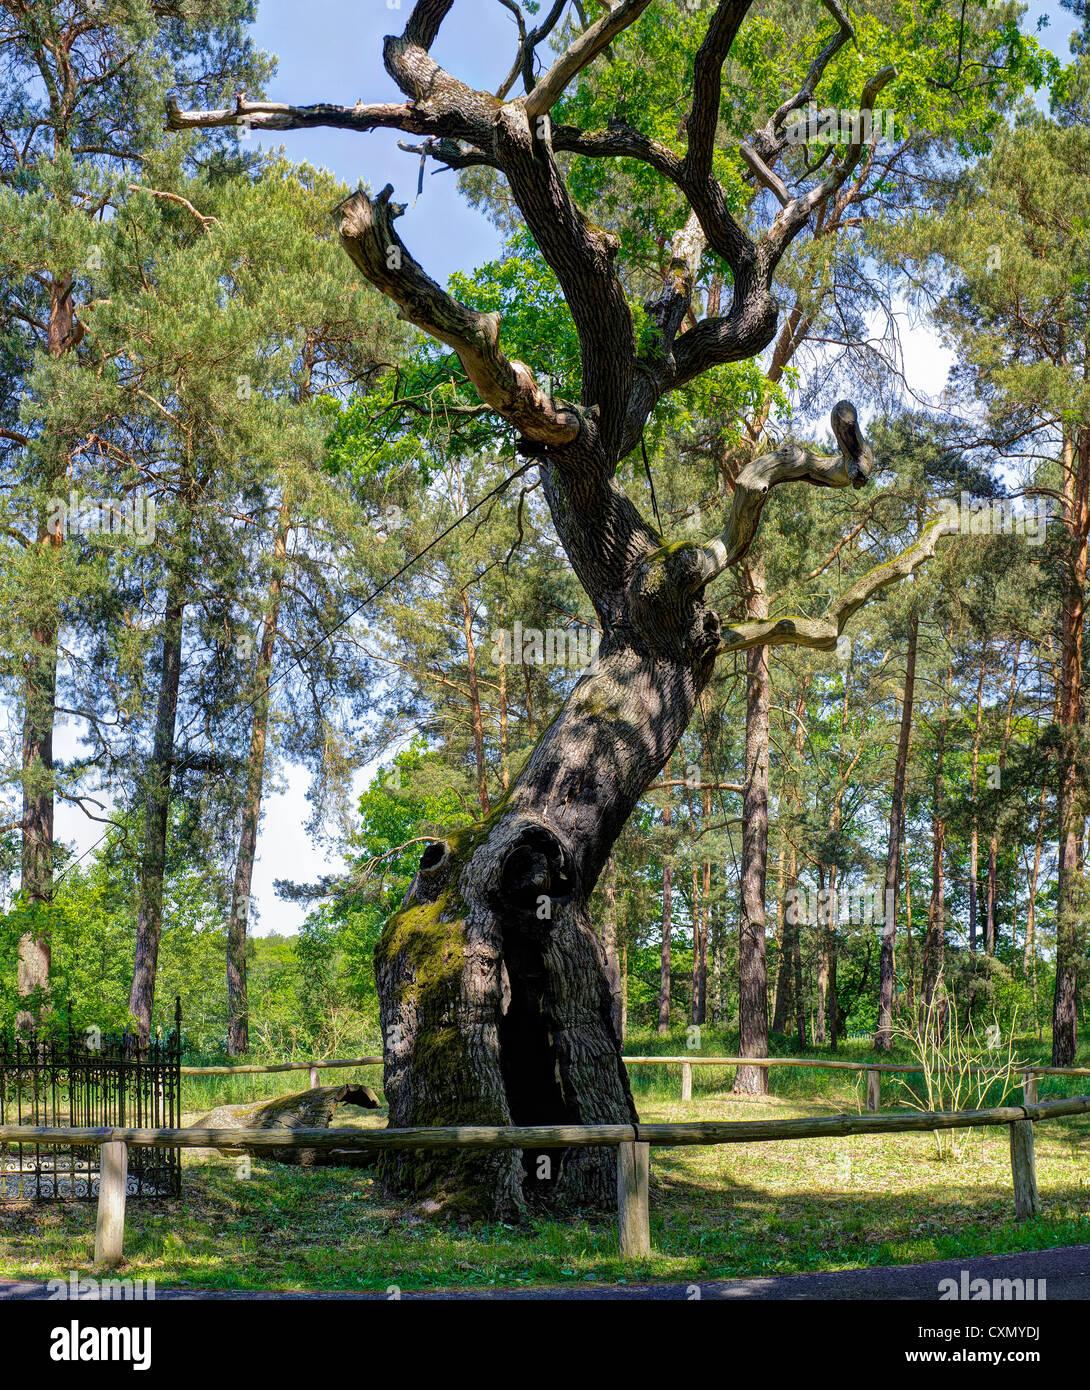 Bosdorf oak at Baruther Glashuette museum village, Baruth Mark, Teltow-Flaeming district, Brandenburg, Germany, - Stock Image